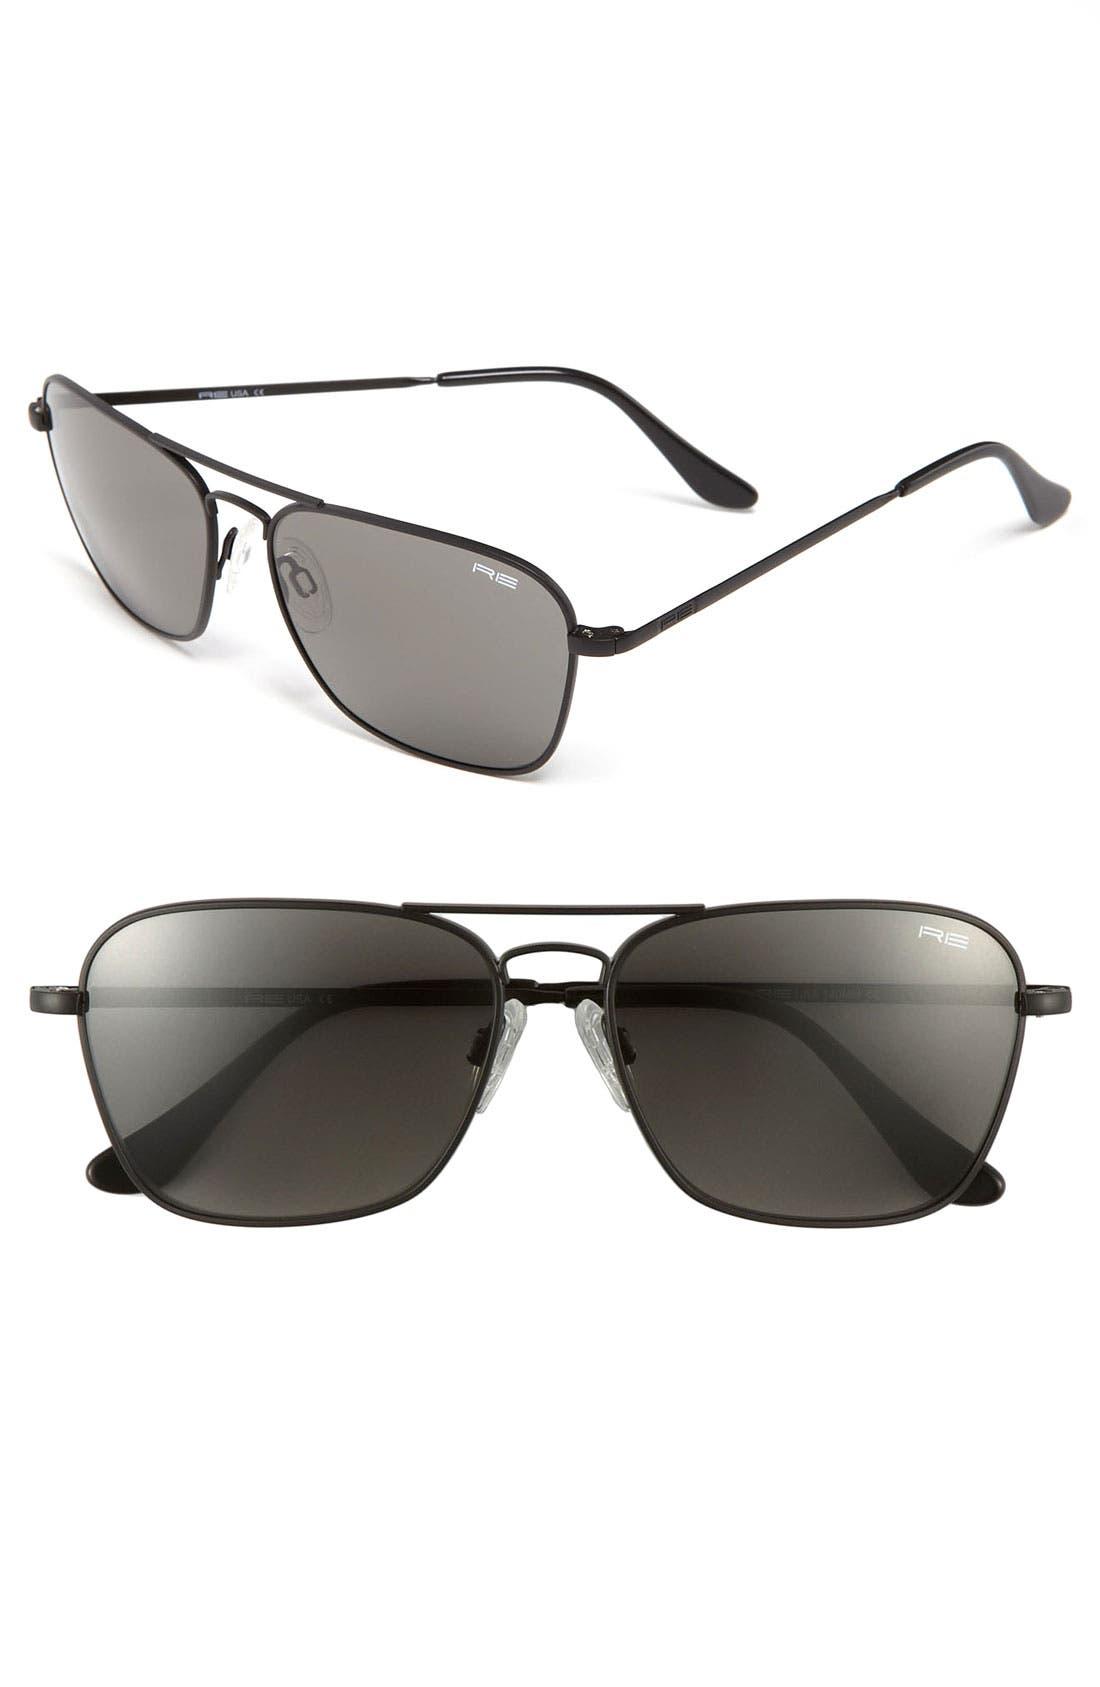 RANDOLPH ENGINEERING 'Intruder' 58mm Sunglasses, Main, color, 002